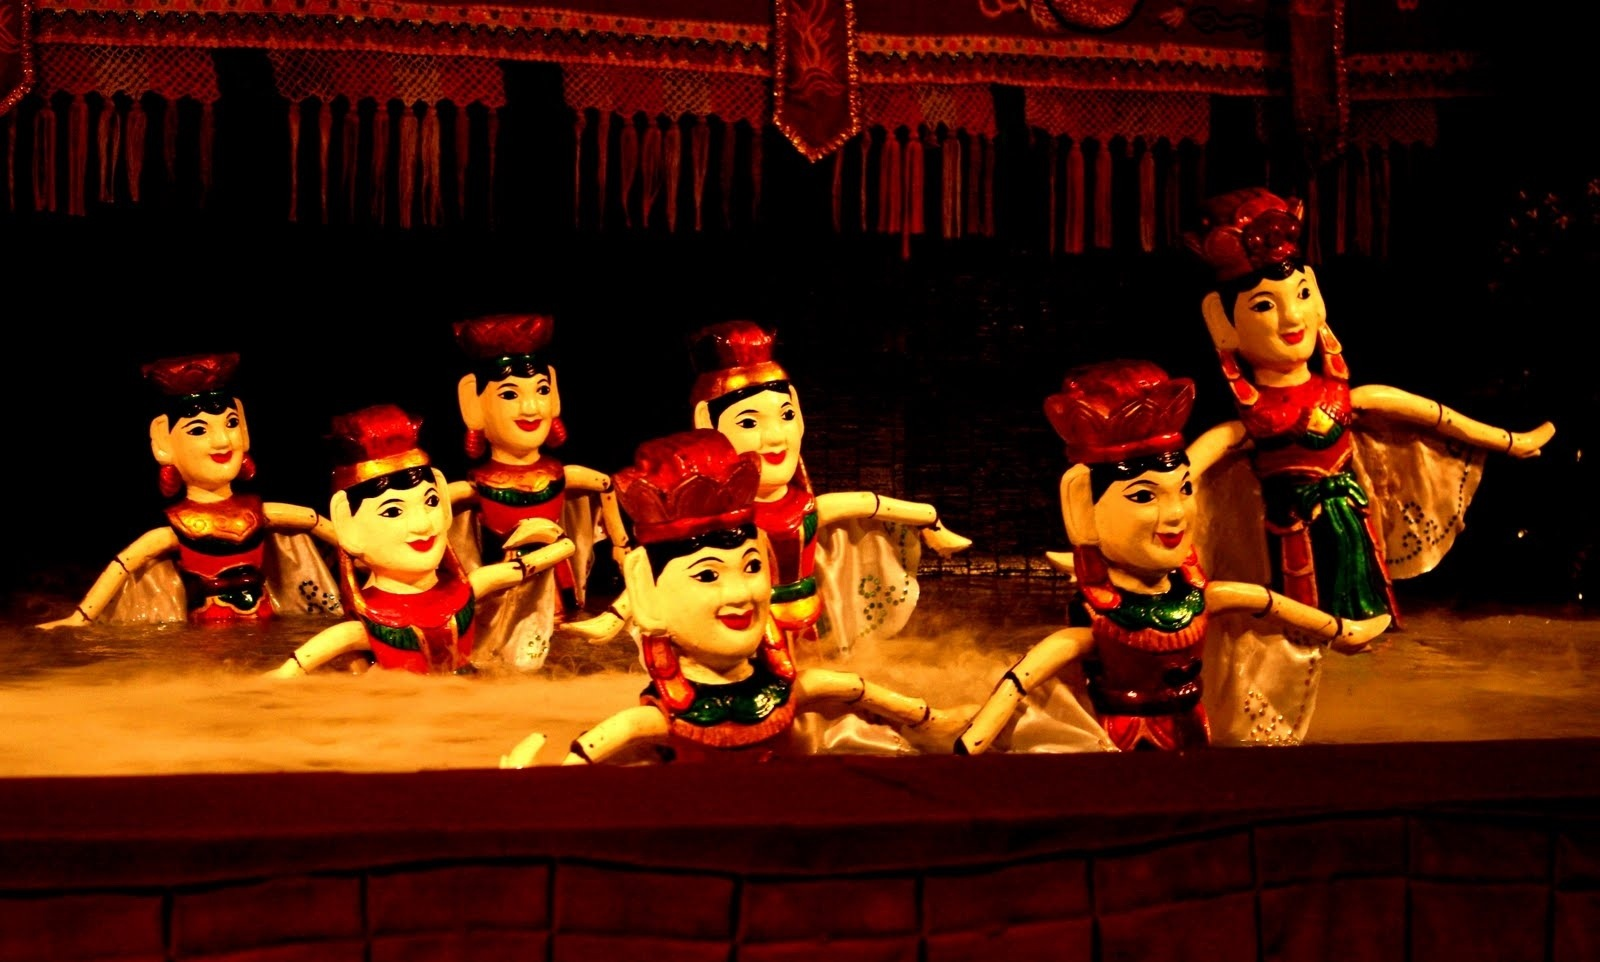 Vietnam water puppet Images